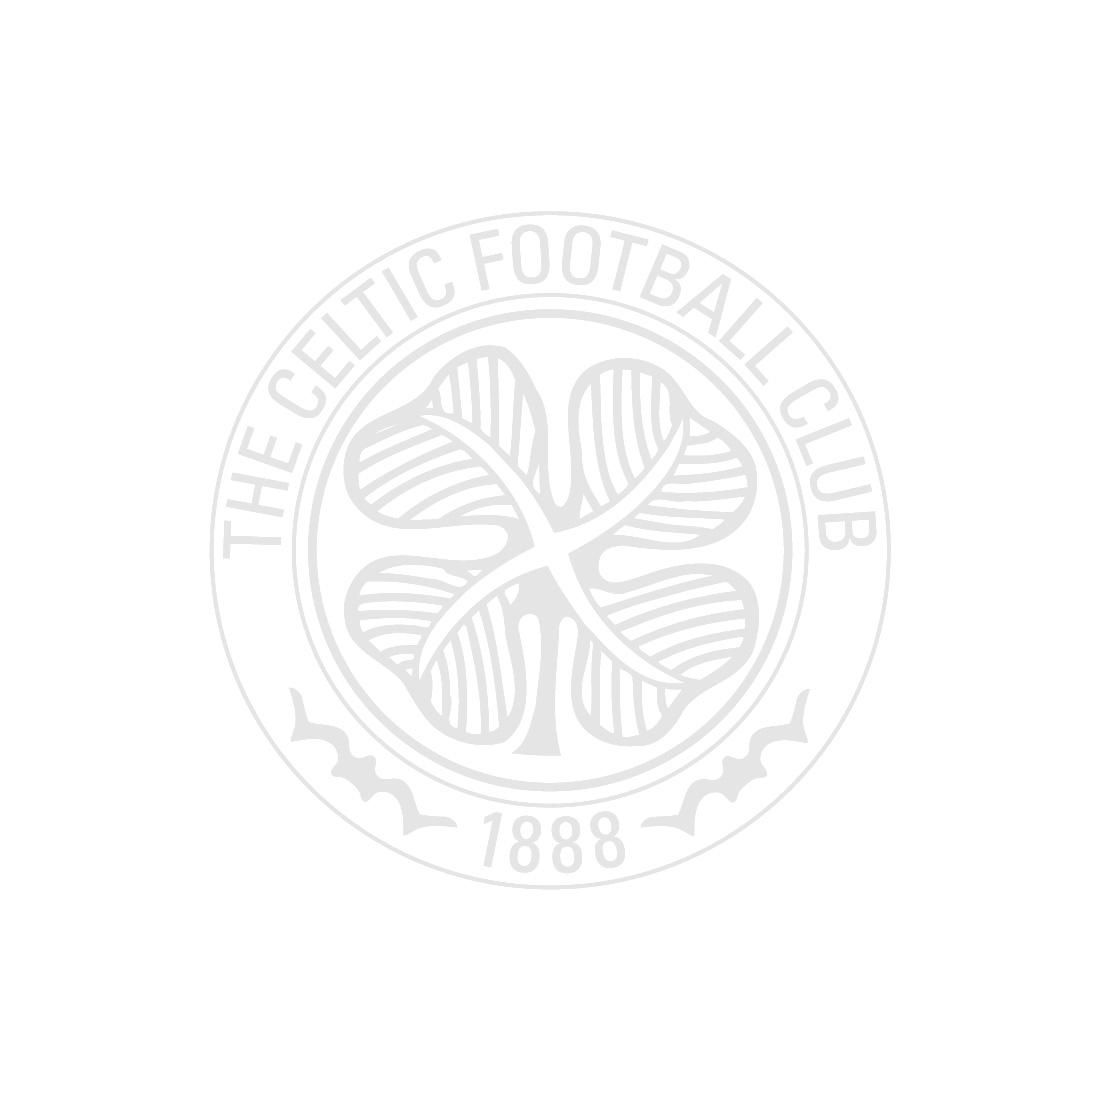 Celtic Luggage Tracker